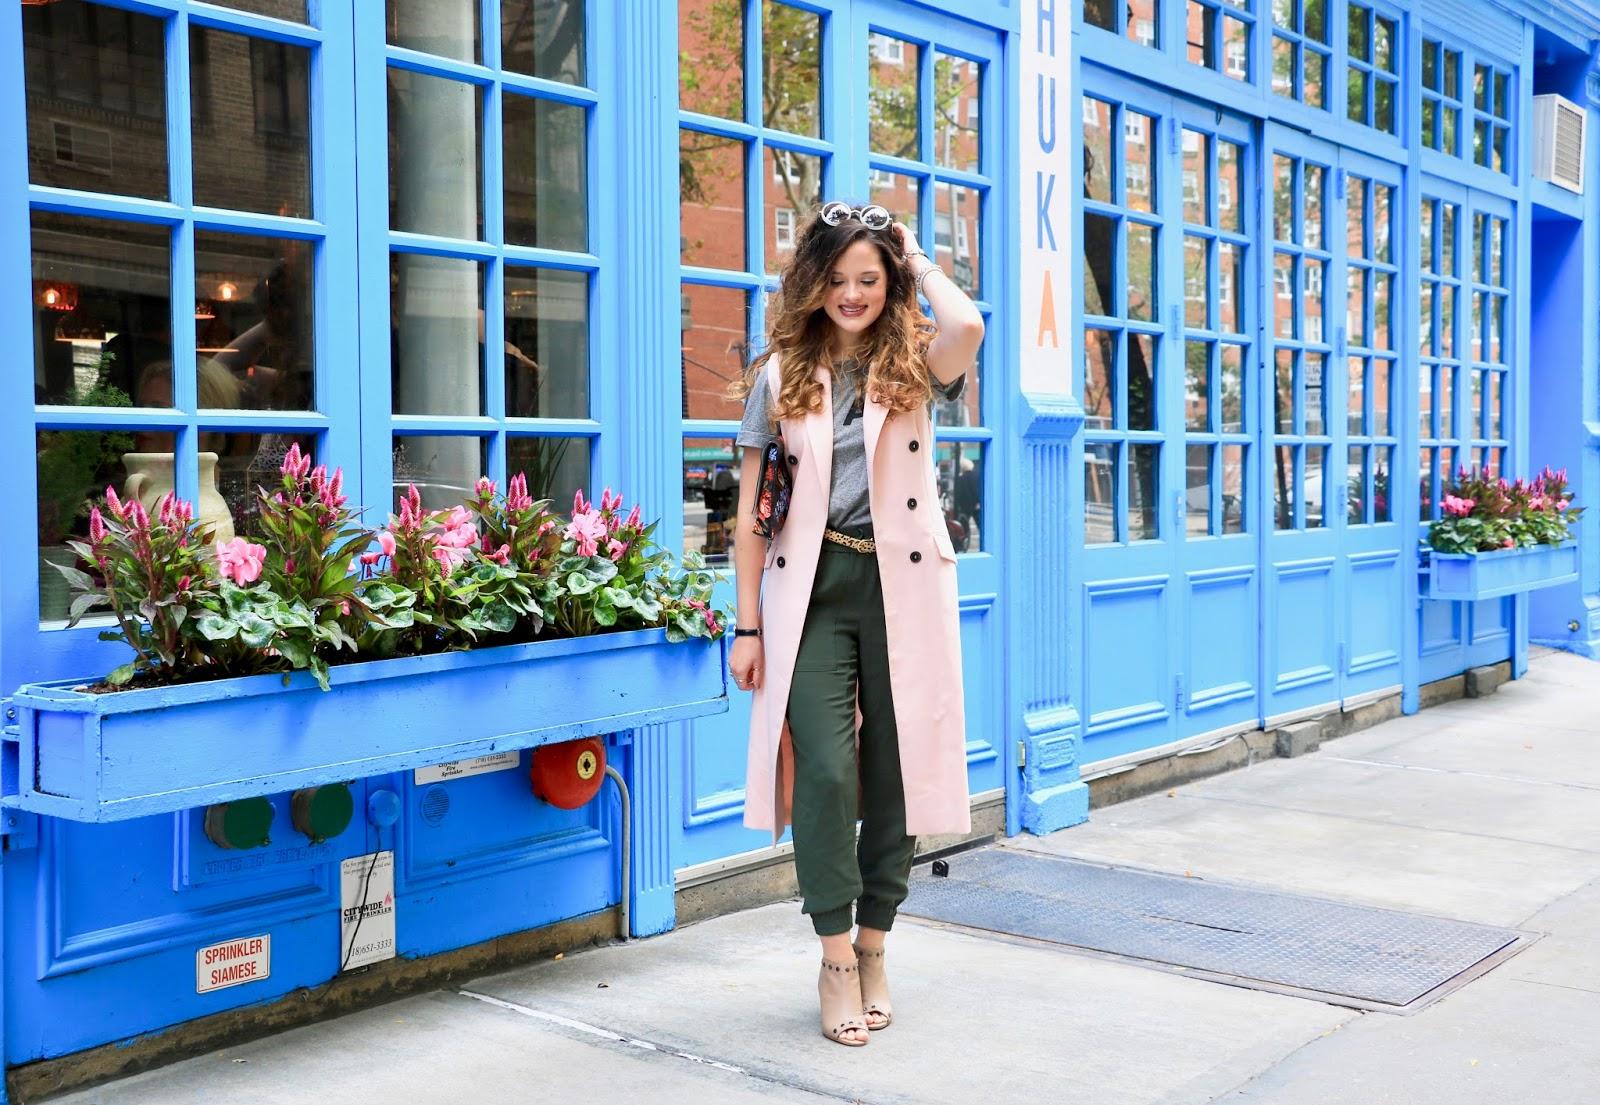 Nyc fashion blogger Kathleen Harper in a long sleeveless coat